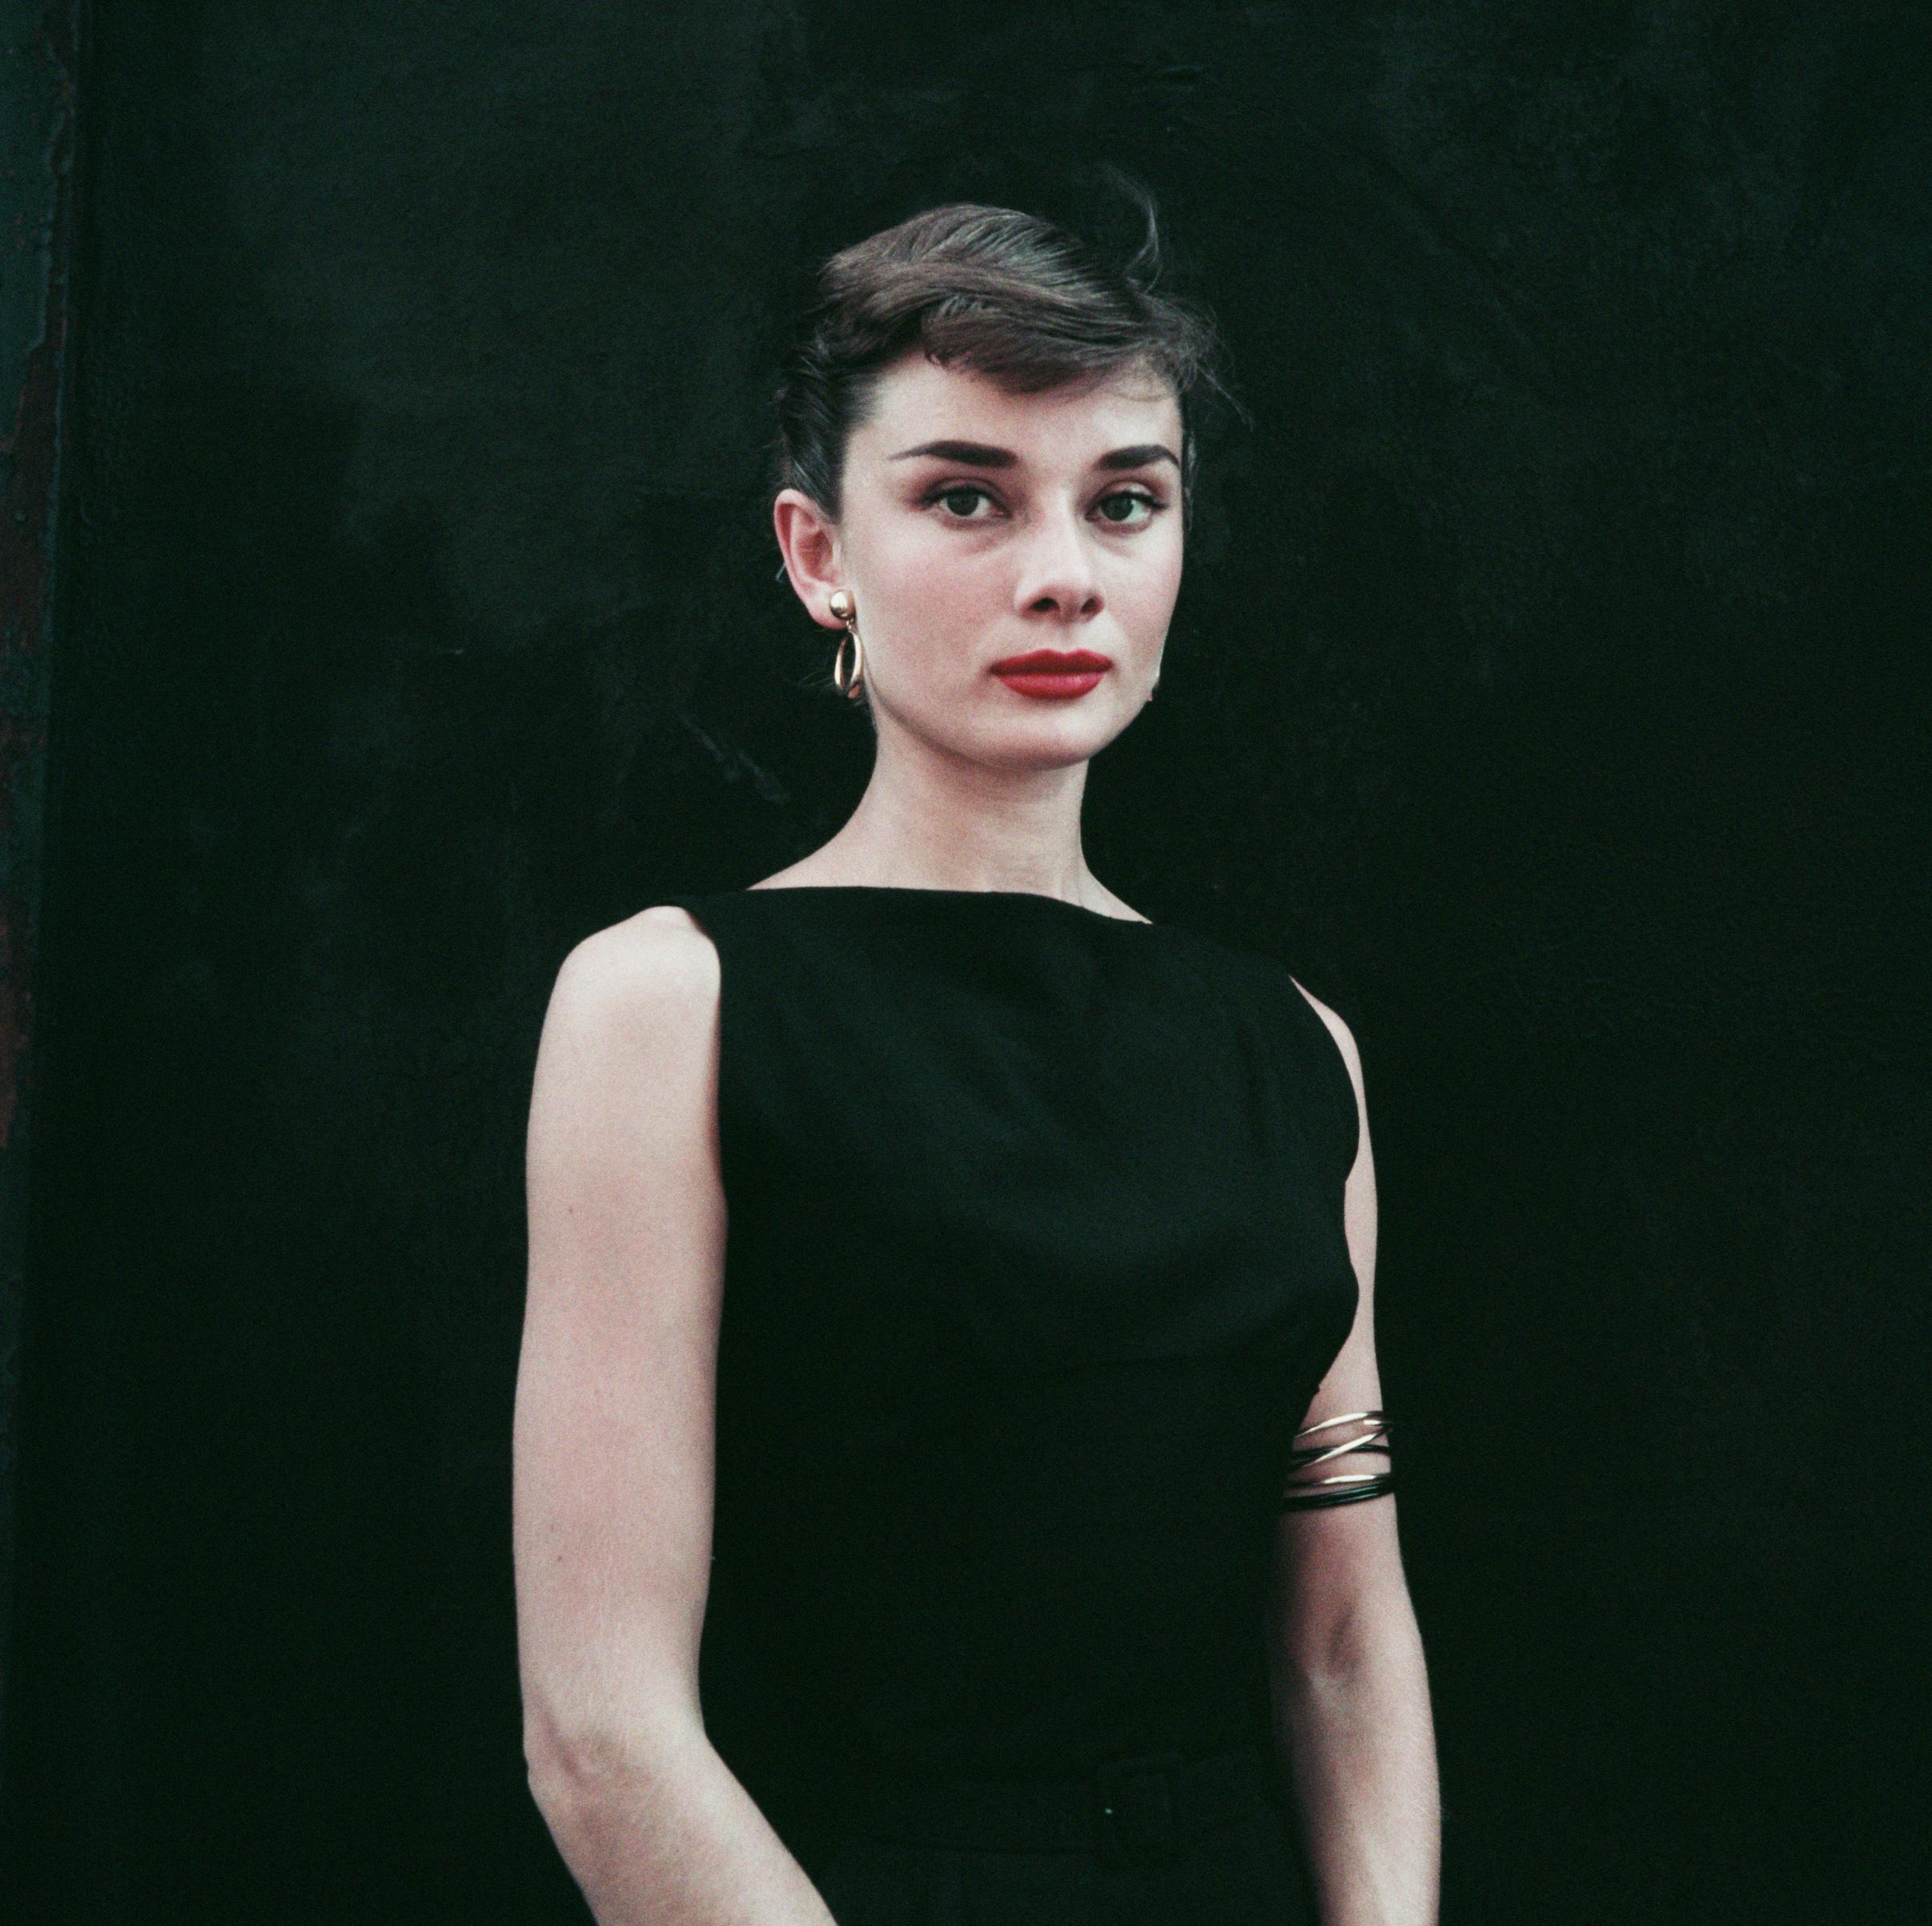 Audrey Hepburn circa 1955